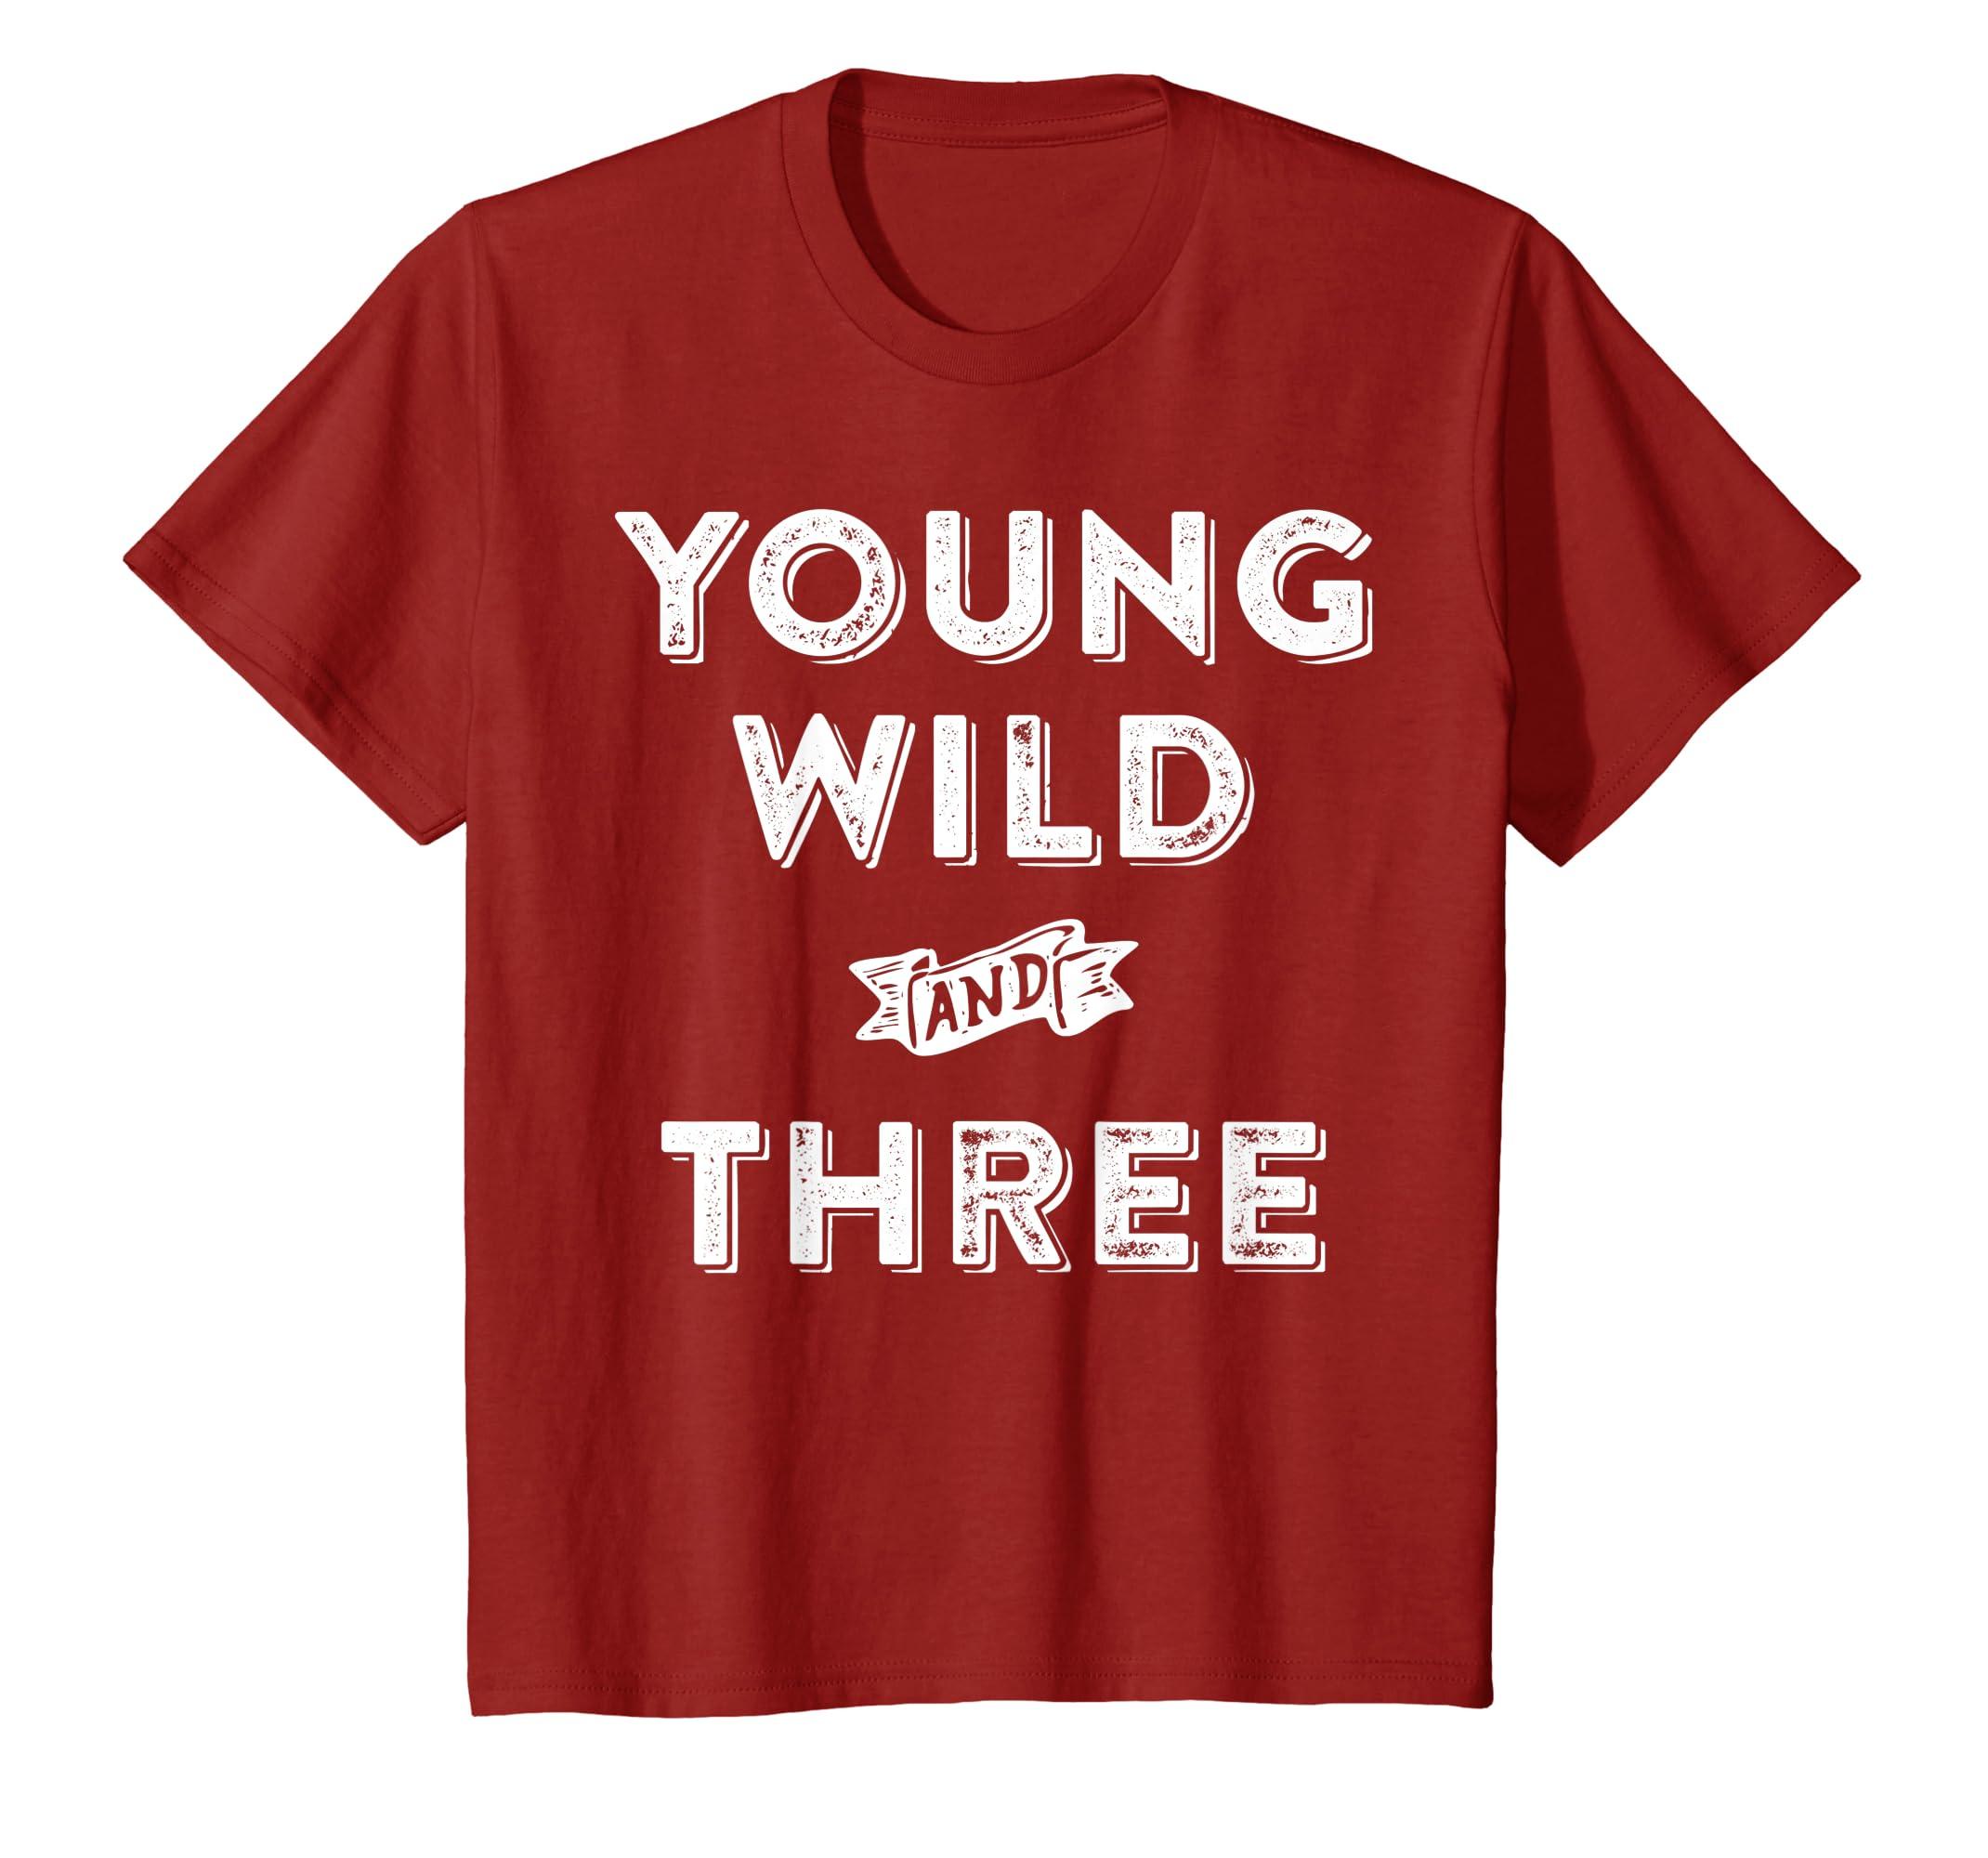 c580f5007 Amazon.com: Kids 3rd Birthday Shirt Boy - Young Wild And Three T-Shirt:  Clothing